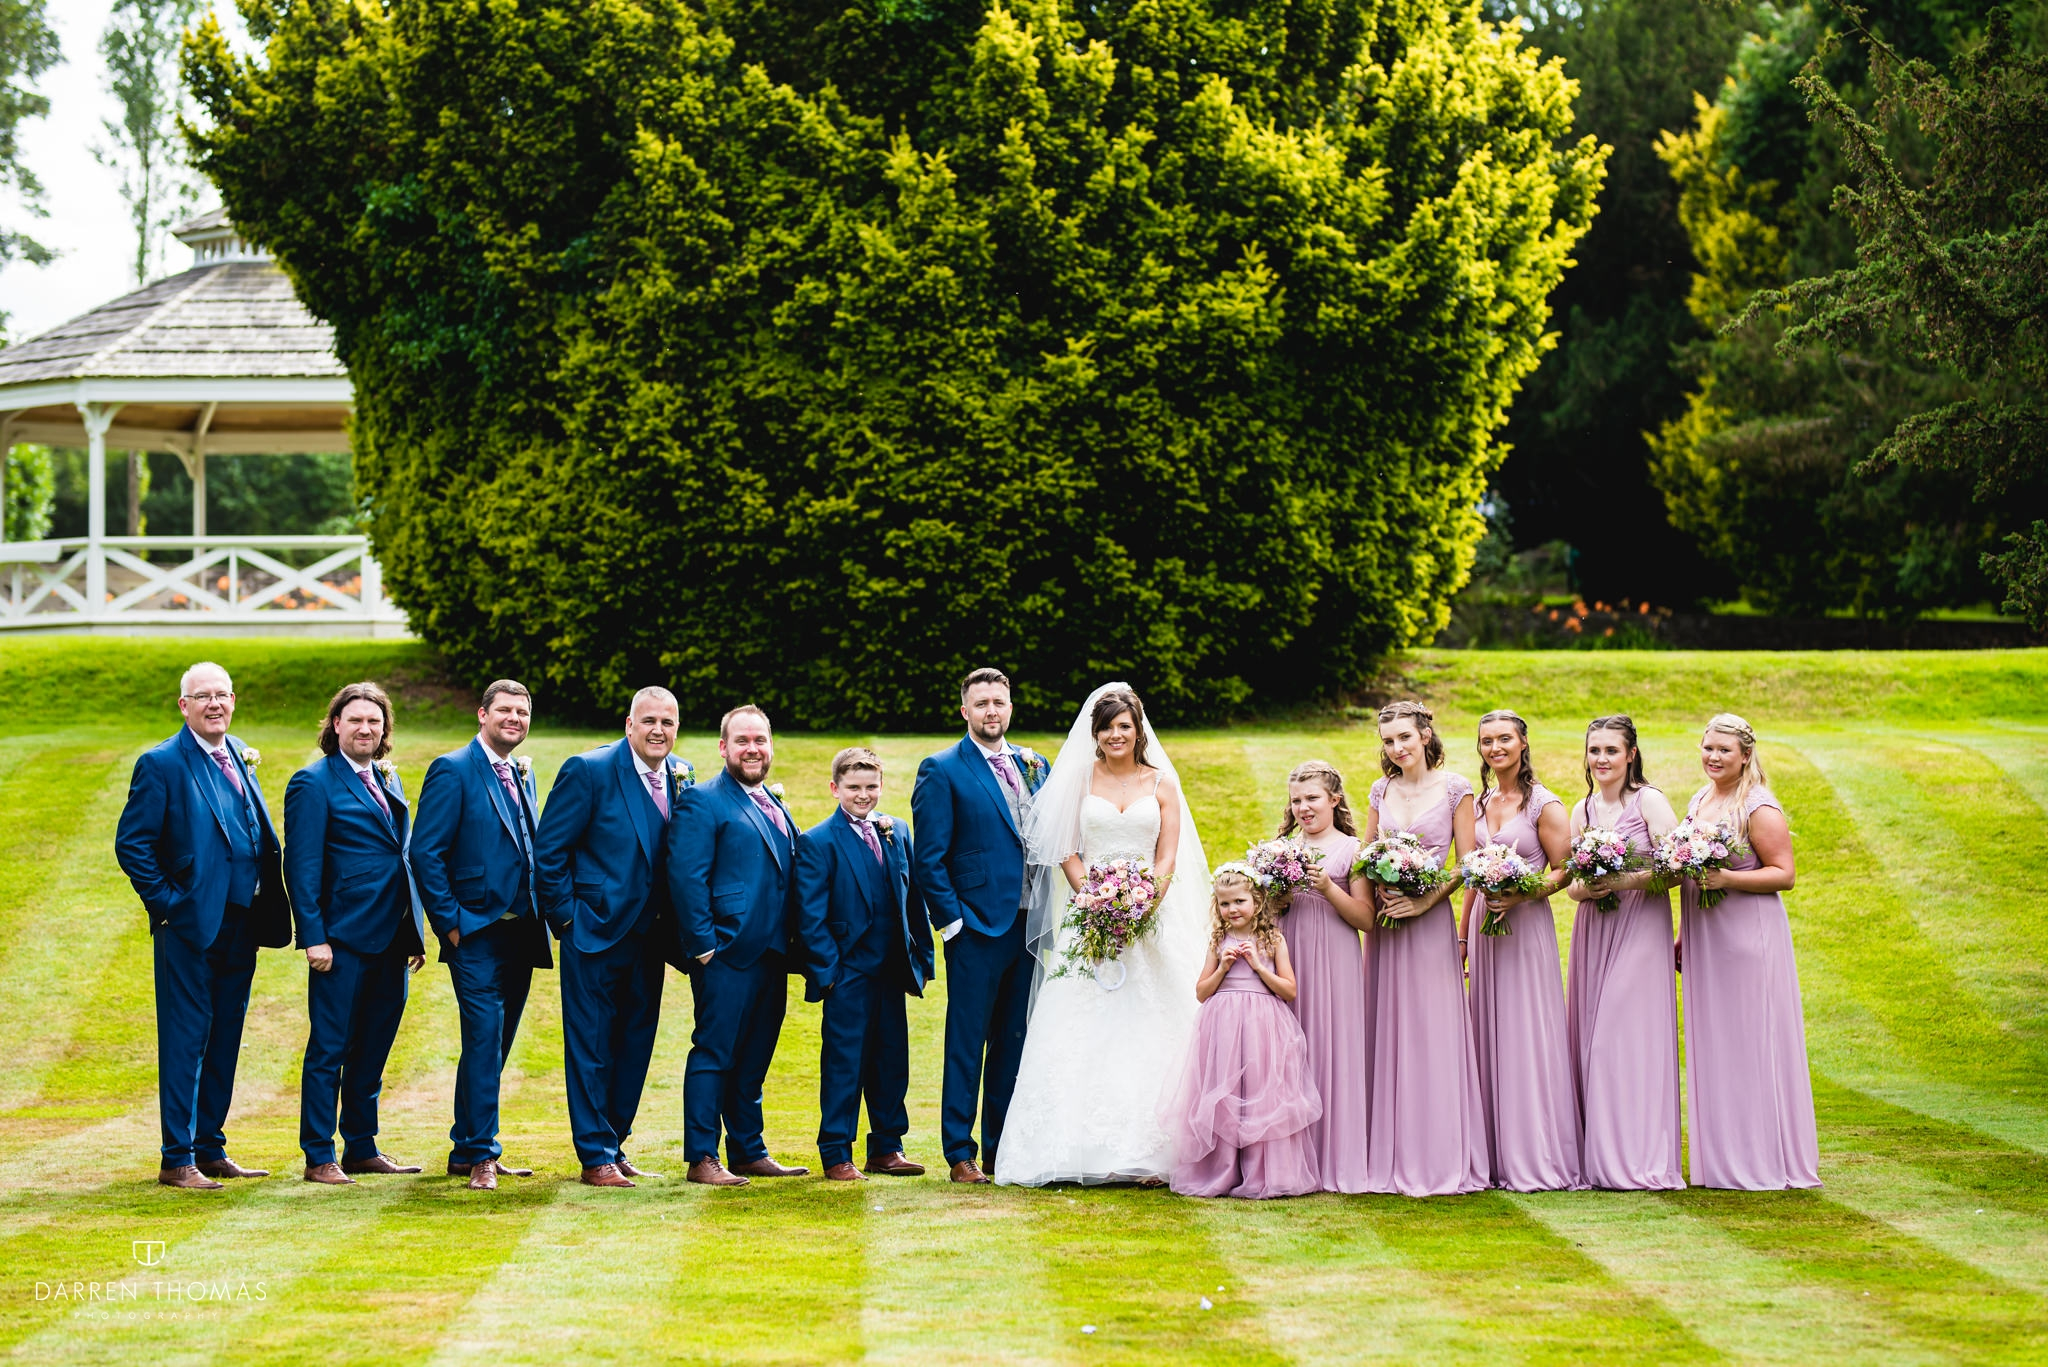 Clearwell-Castle-Wedding-Photographer-wedding-photography-Gloucestershire